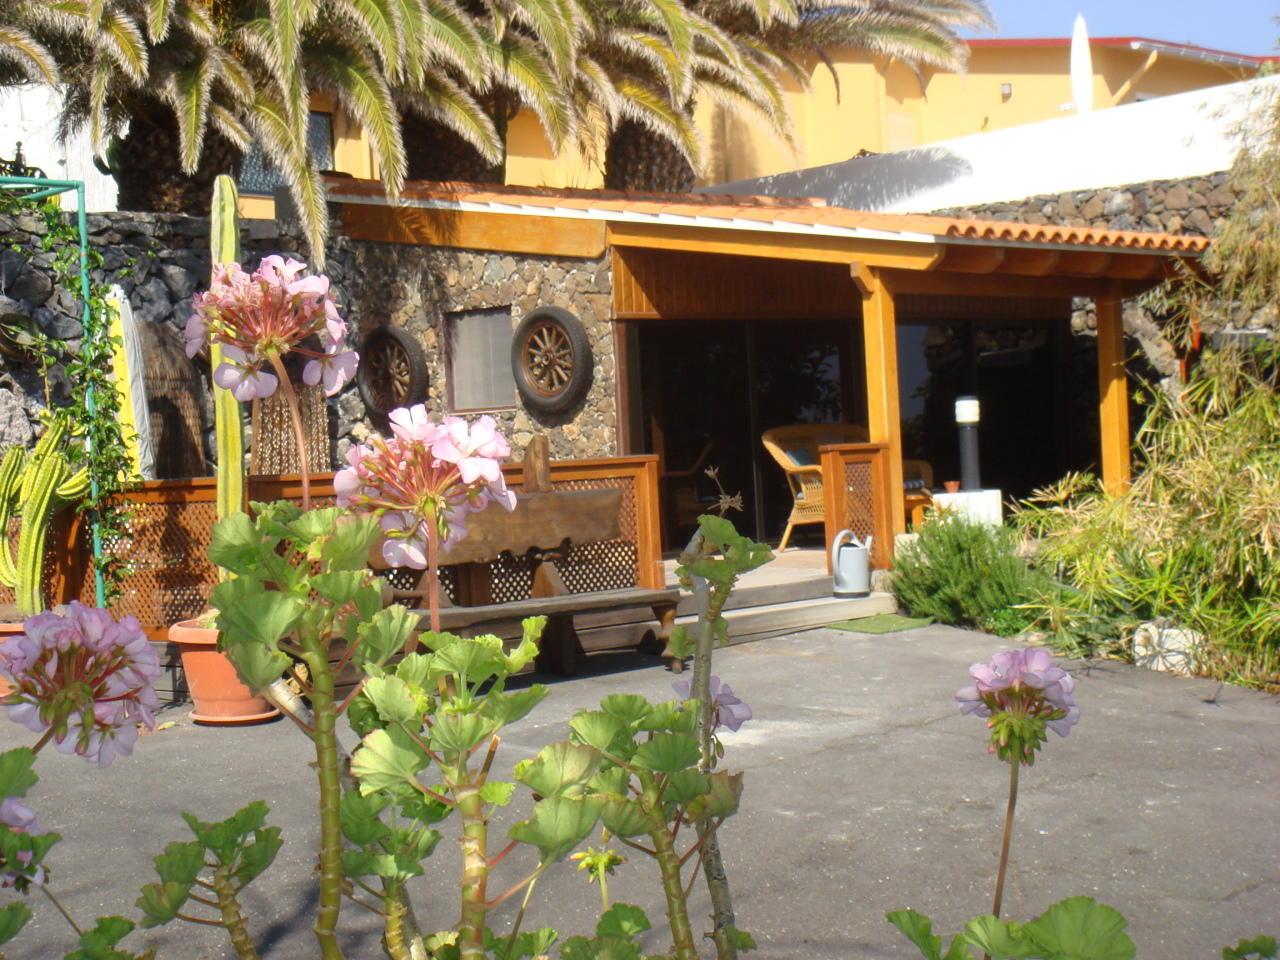 Teneriffa: Finca Alcalá Lodge